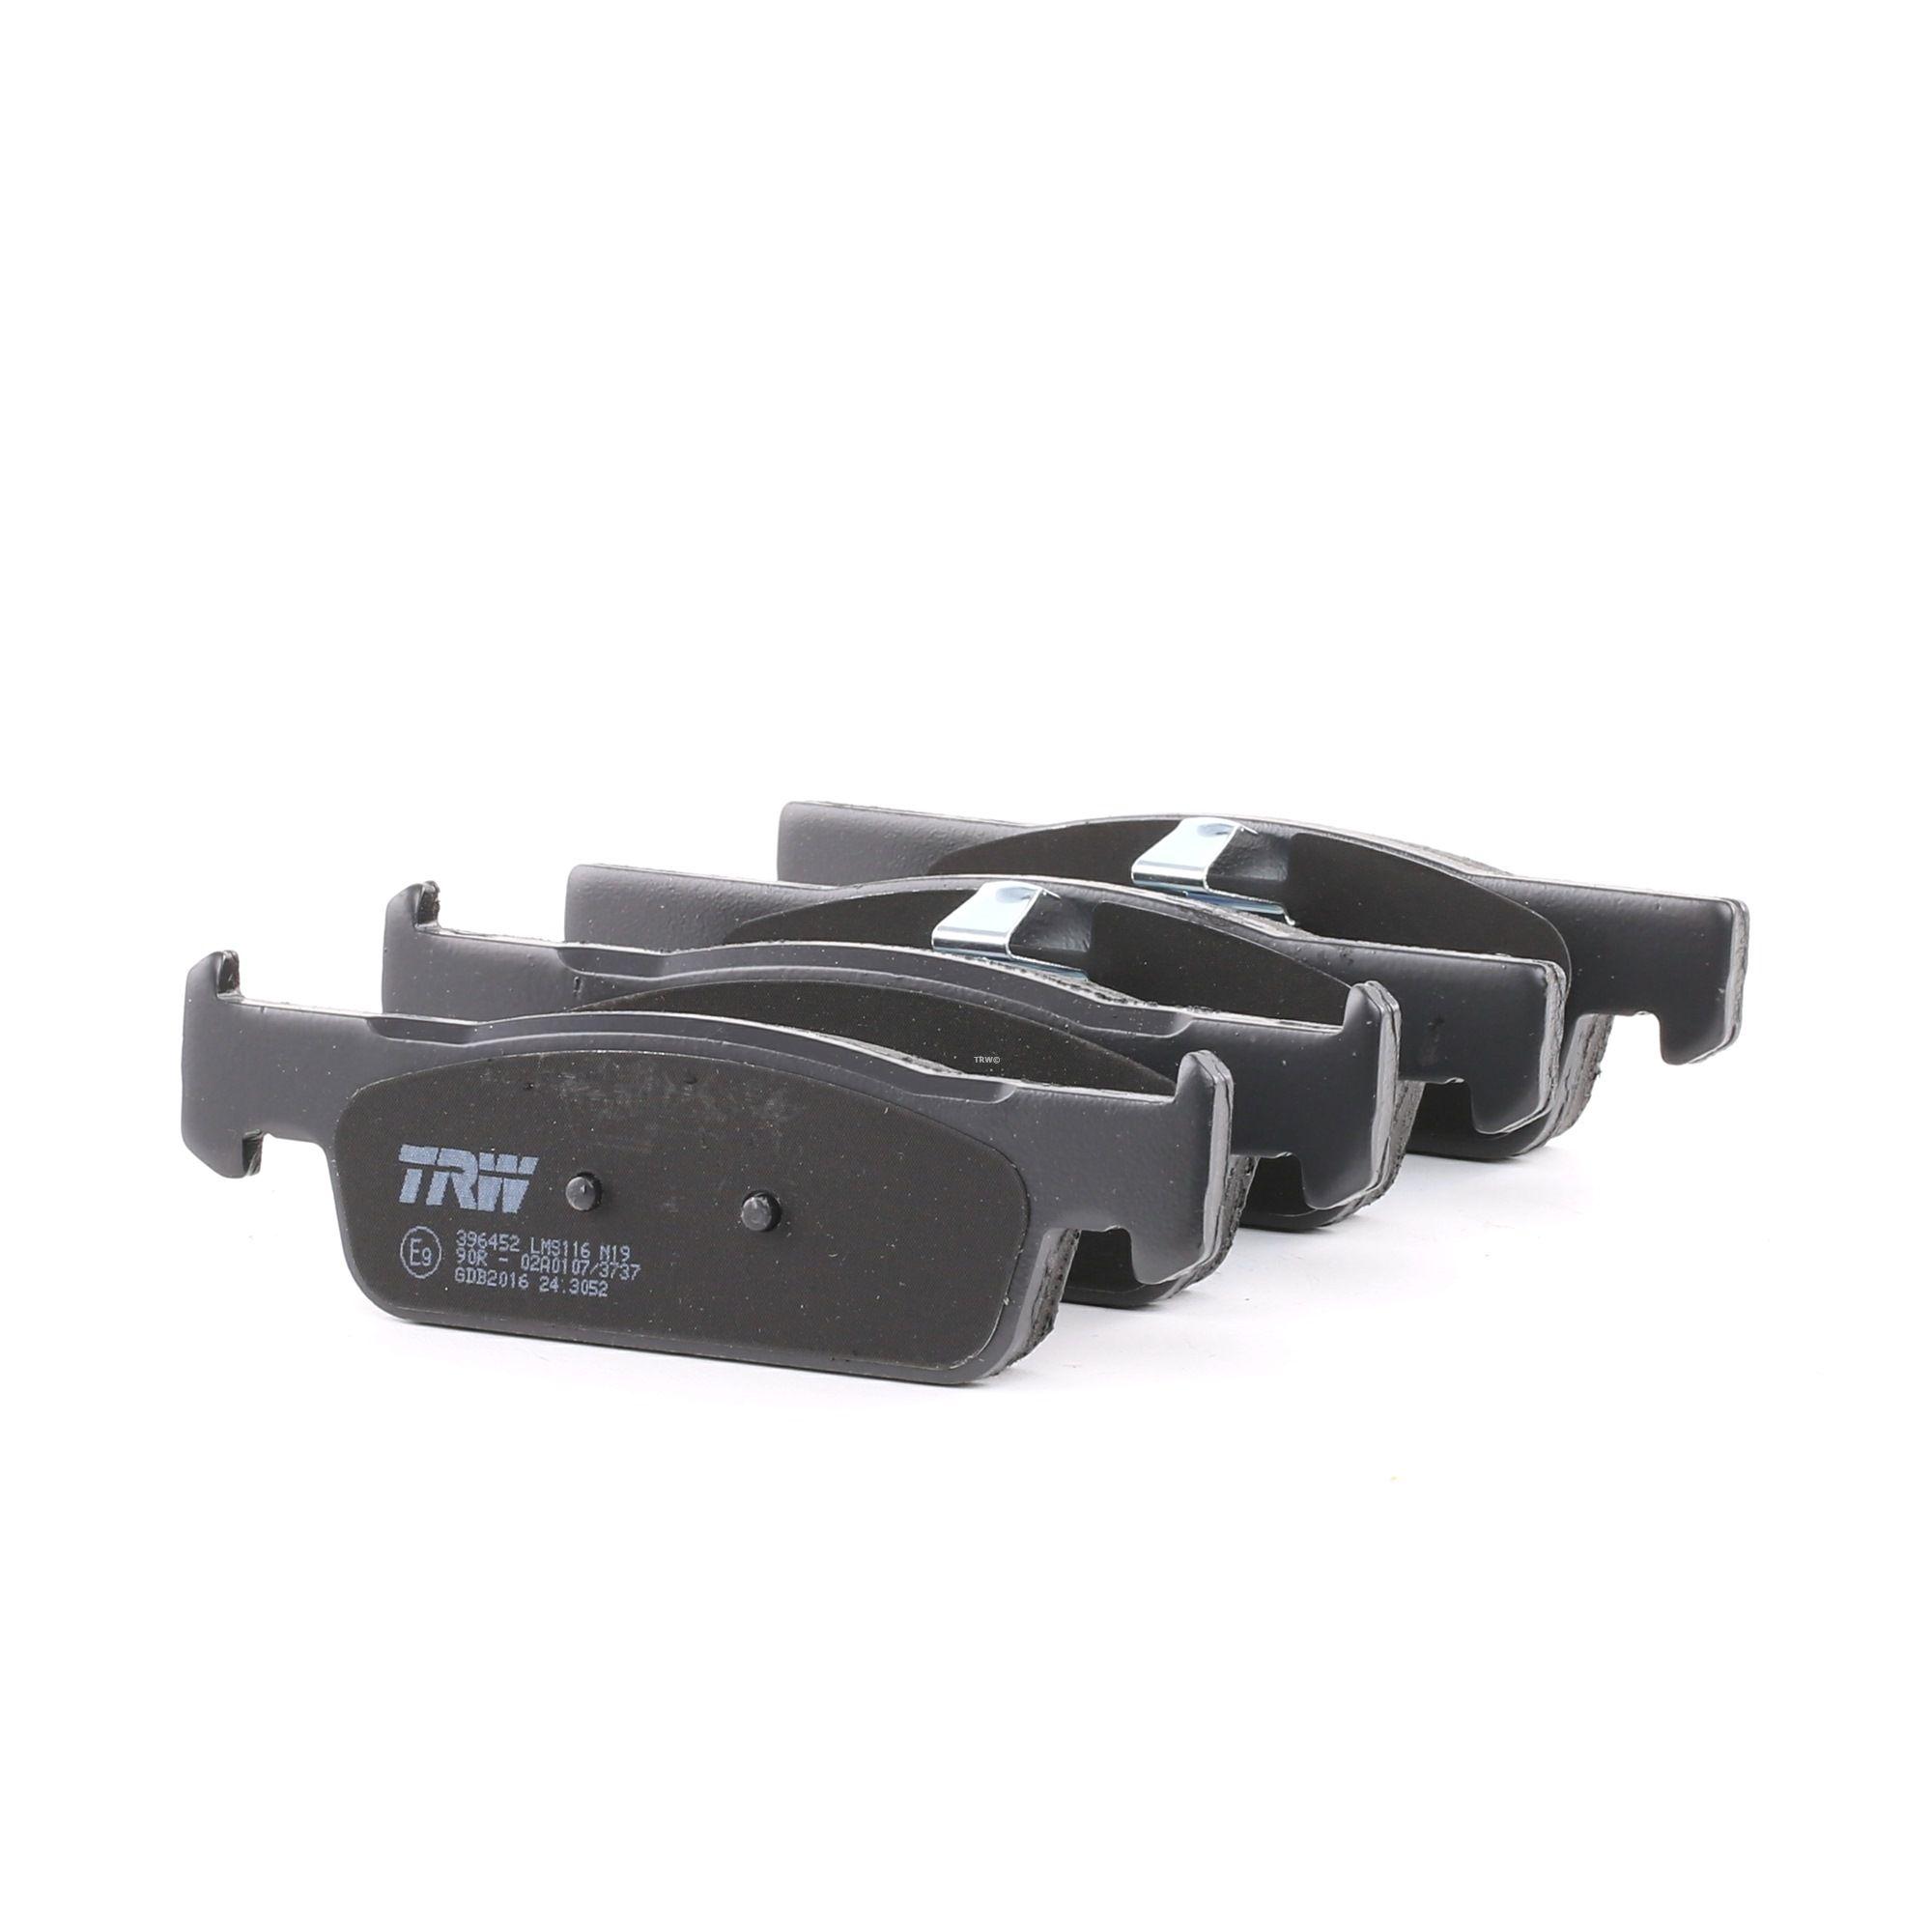 TRW: Original Bremsbelagsatz GDB2016 (Höhe: 42,00mm, Dicke/Stärke: 18,00mm)